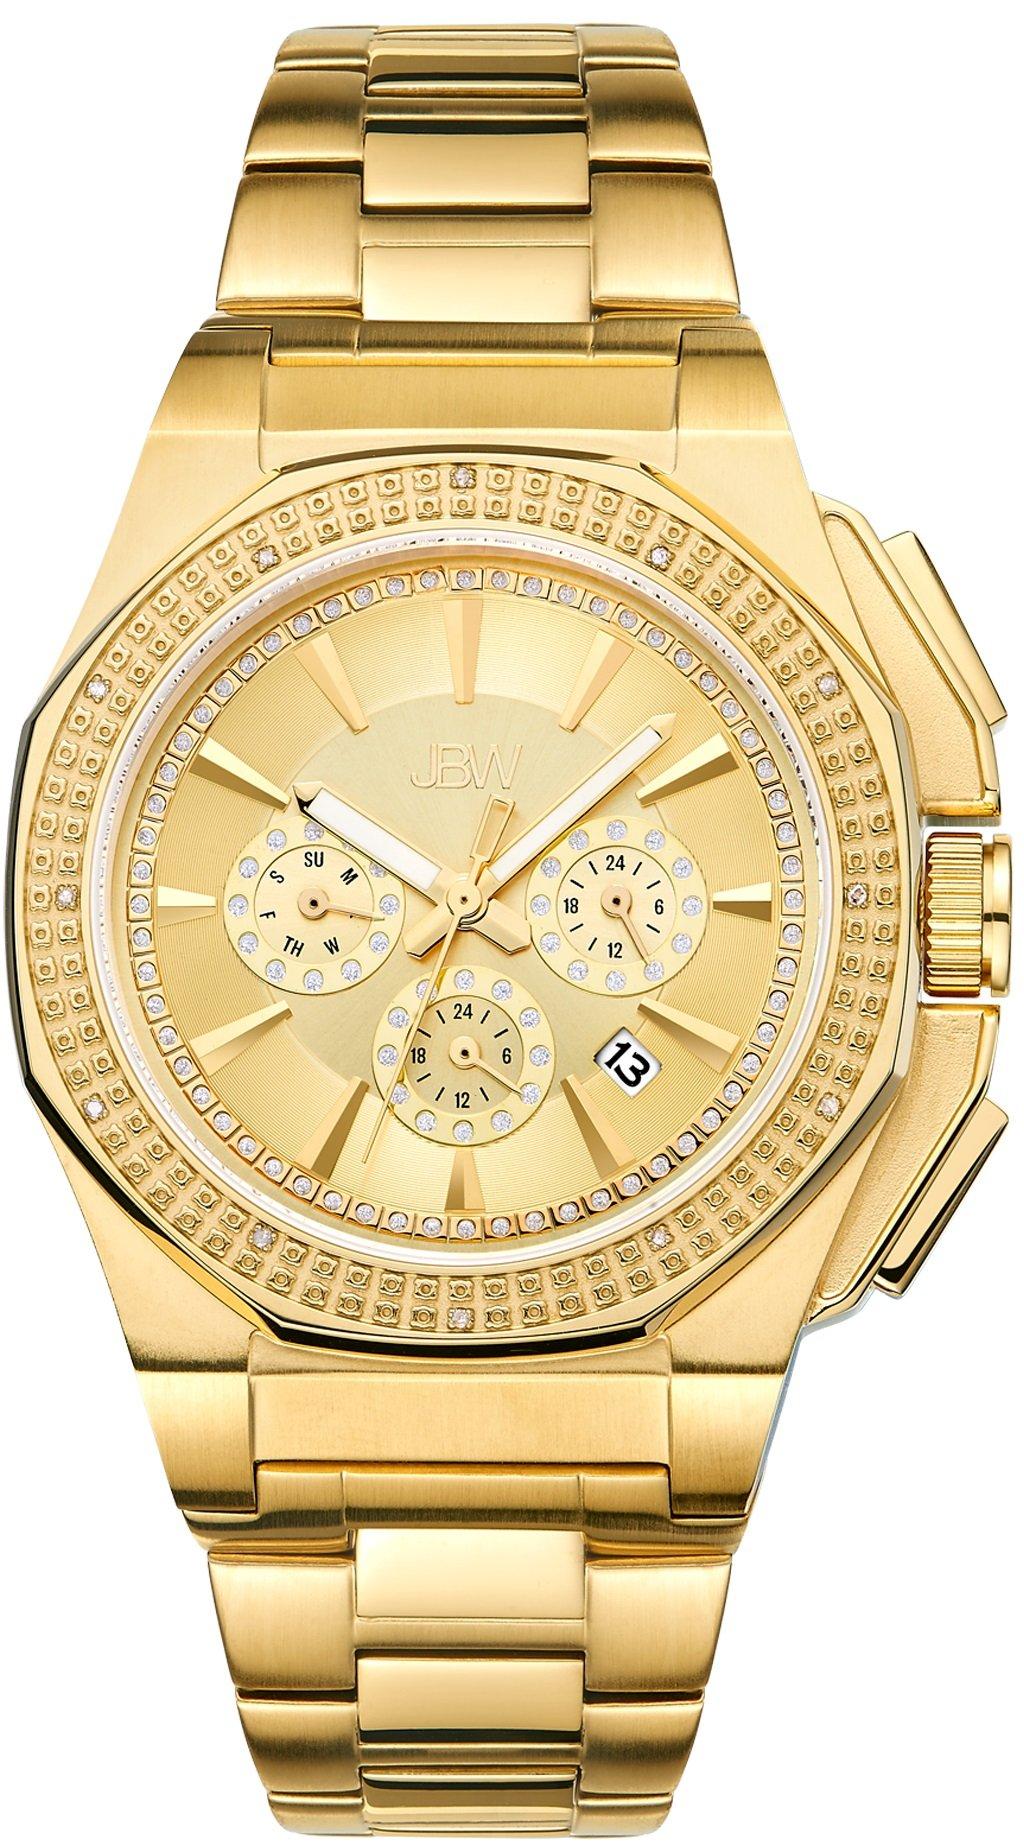 "Jbw Men's J6329B ""Knox"" Stainless Steel Chronograph Diamond Watch 2"